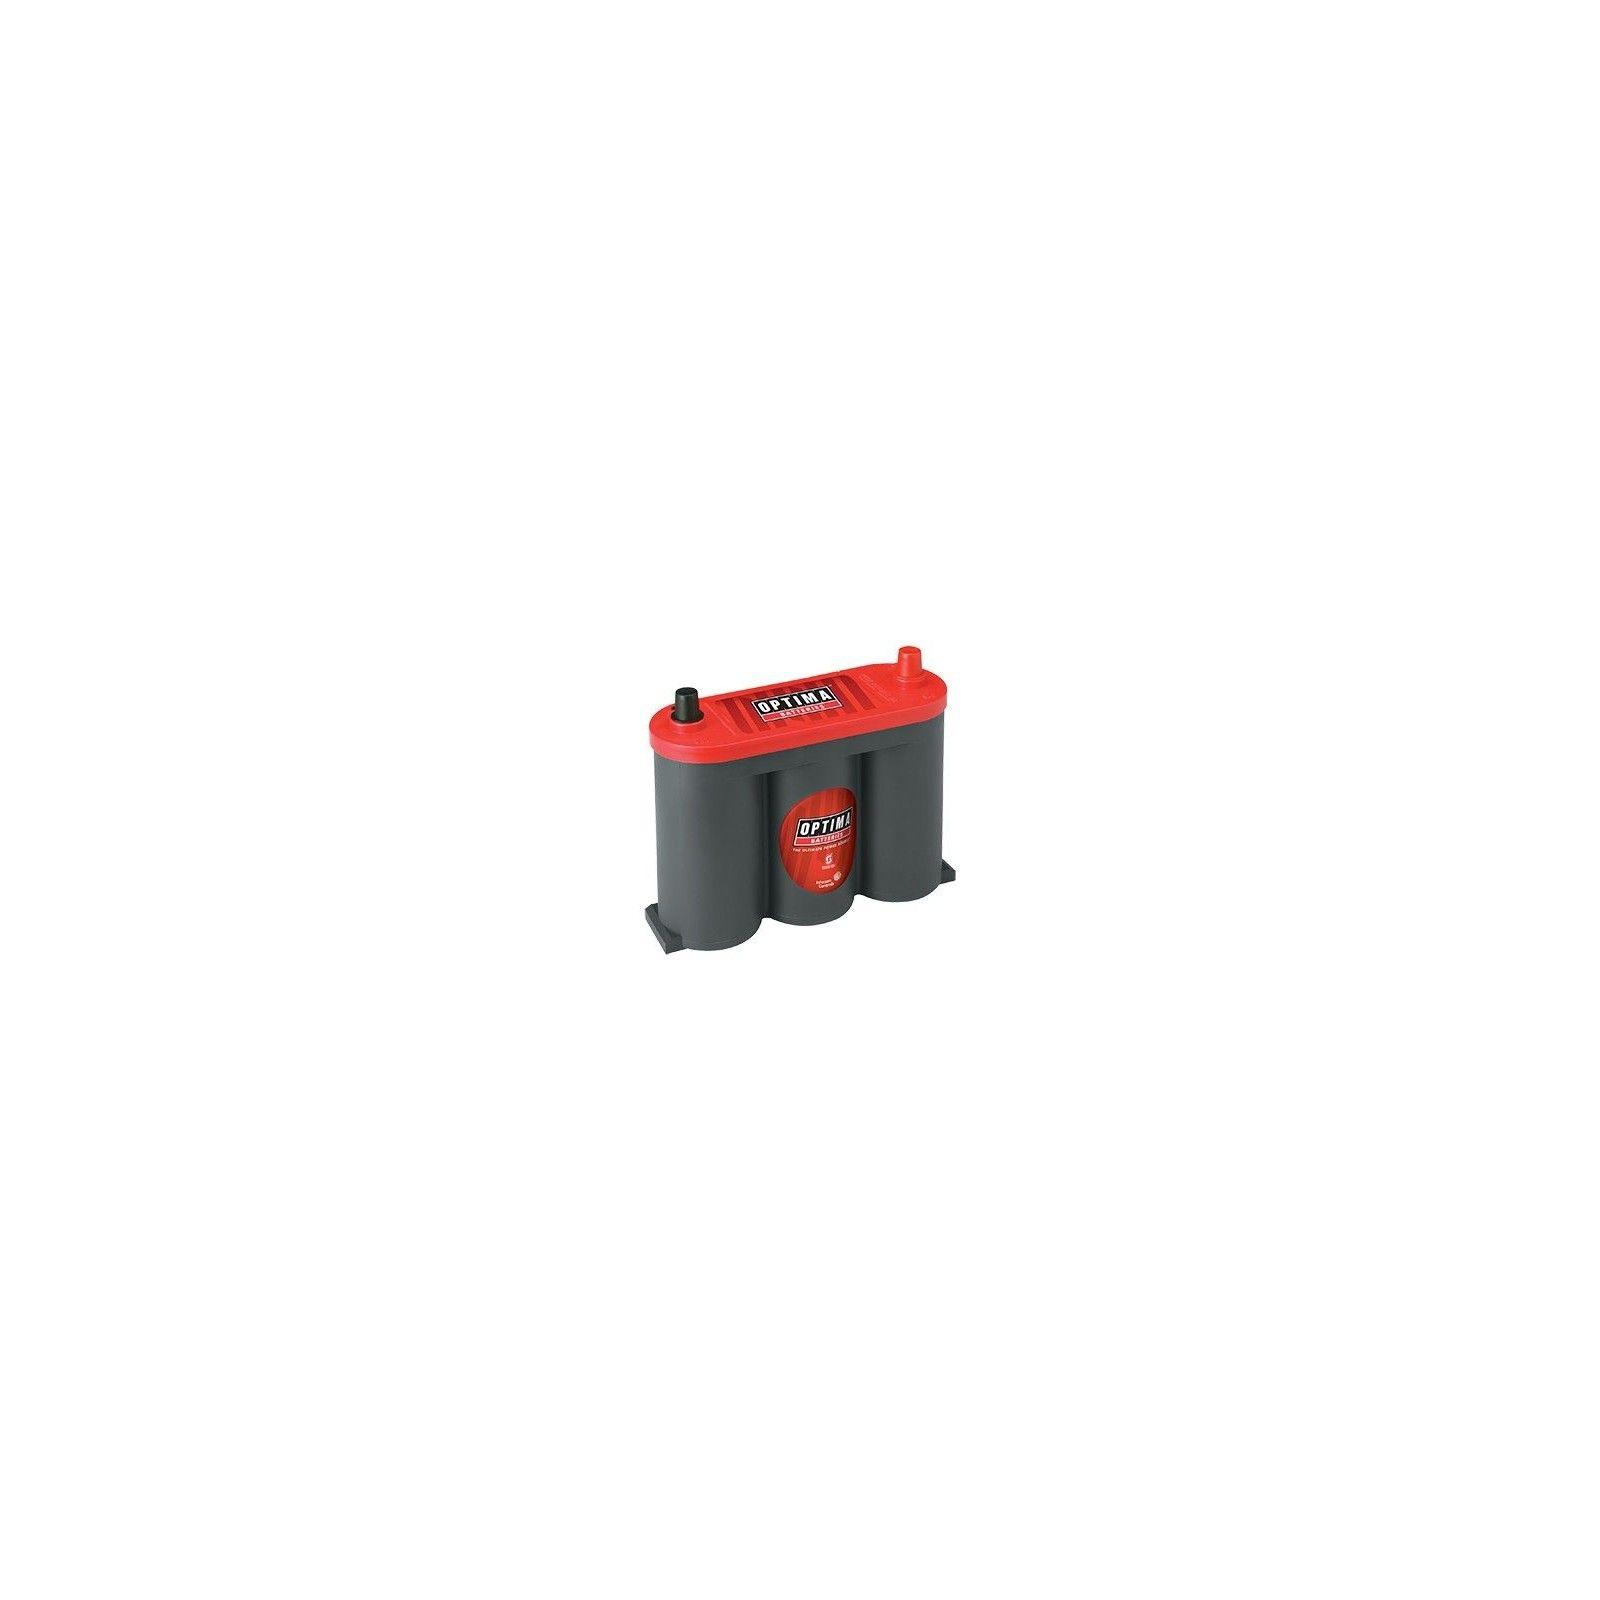 Batería Optima RTS-2.1 50Ah 815A 6V Red Top OPTIMA - 1